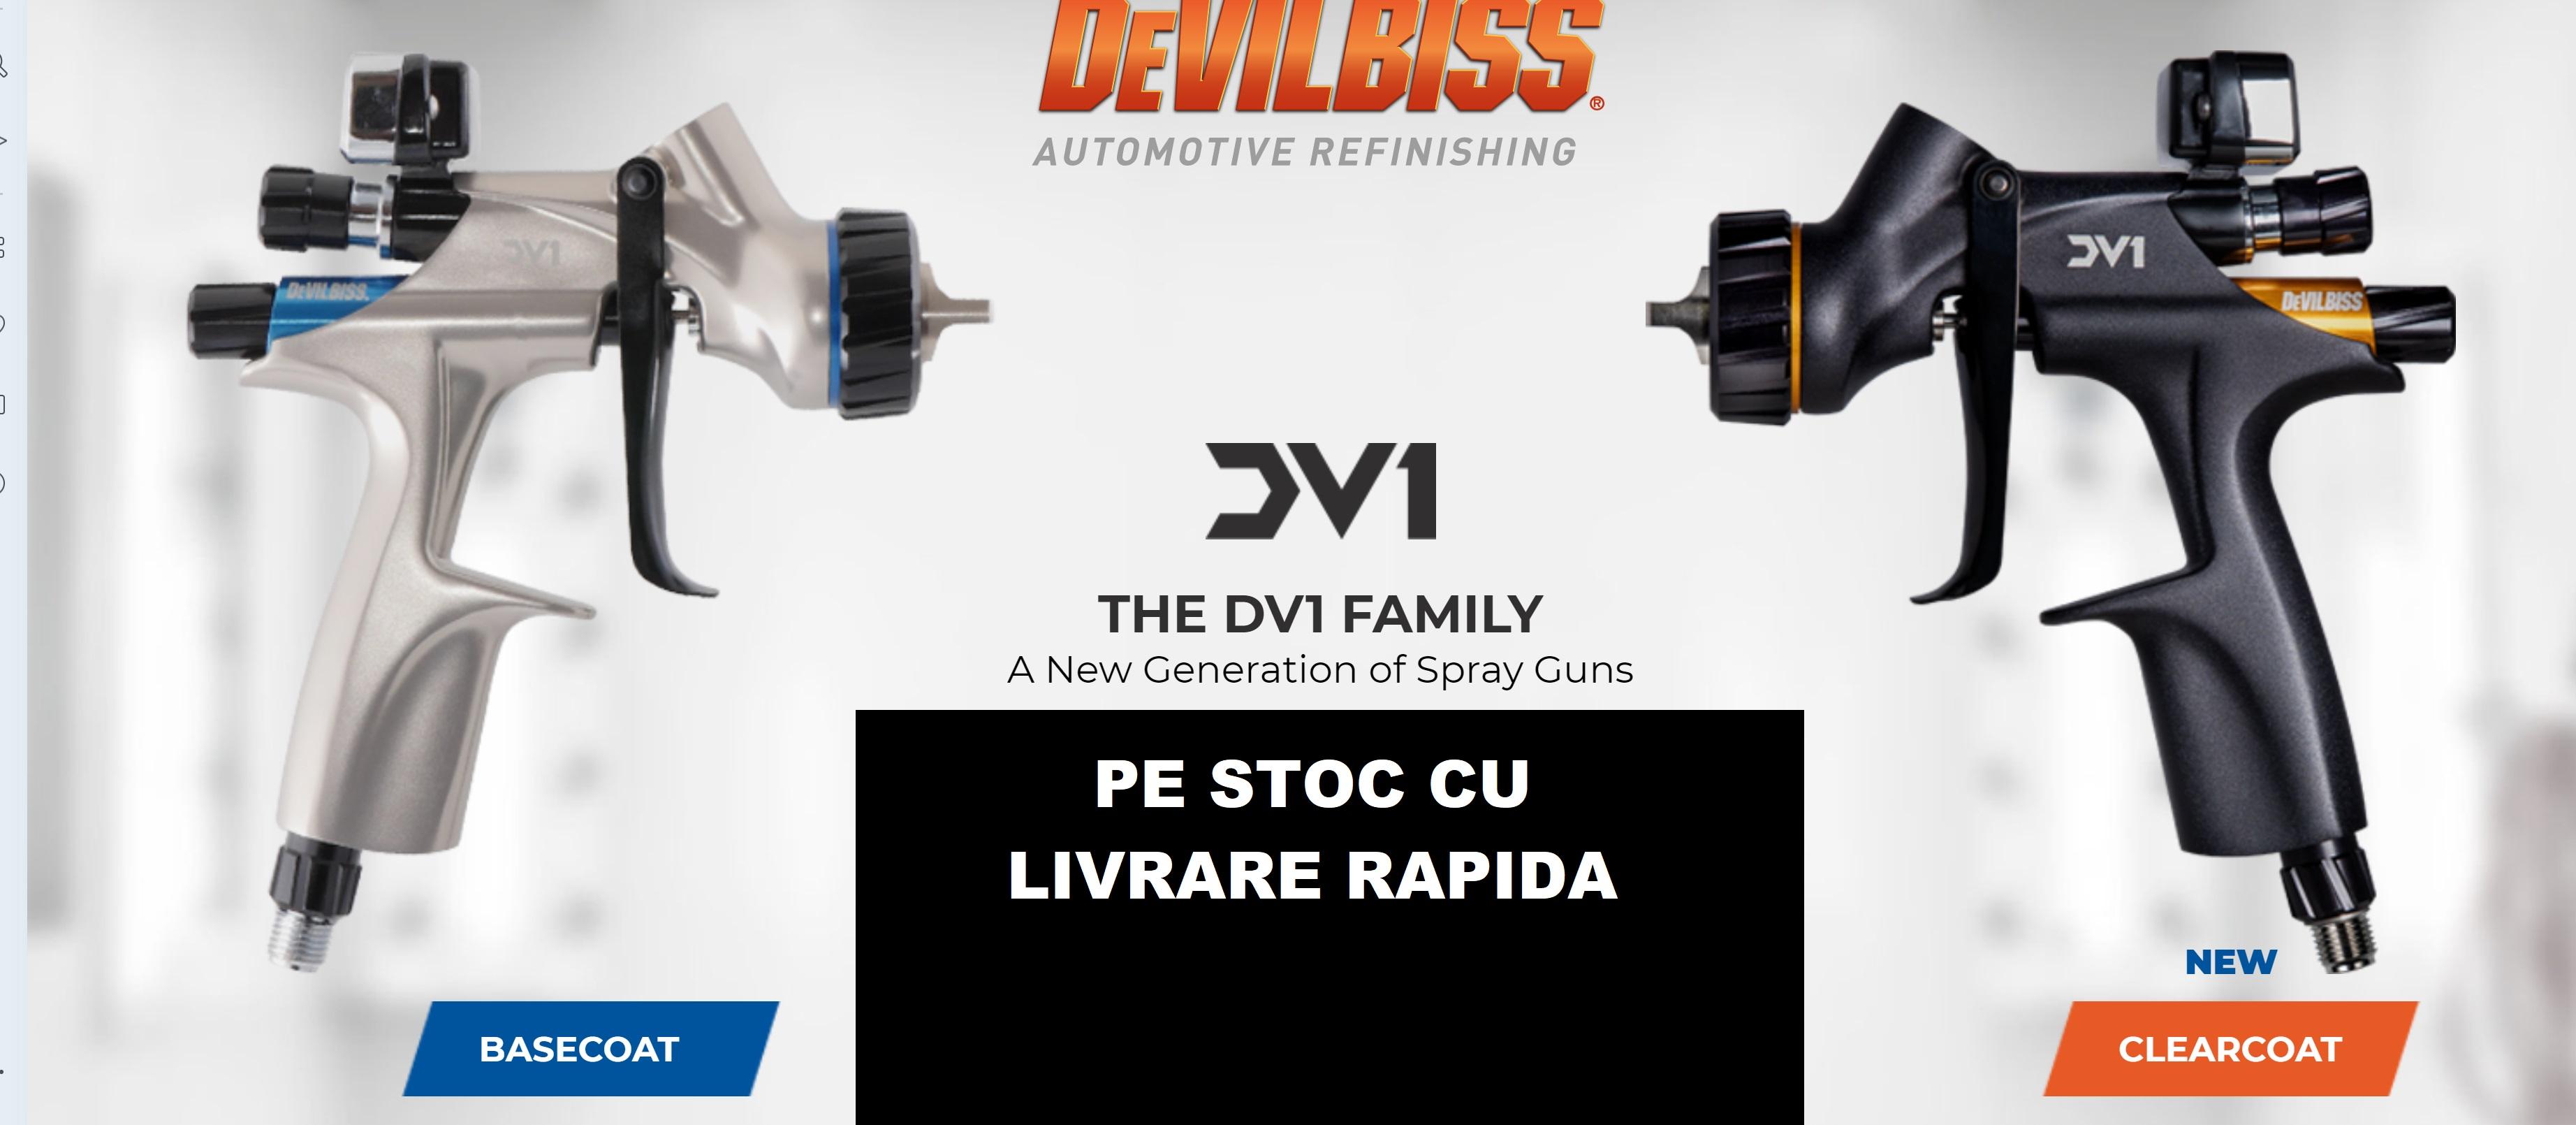 DeVilbiss DV1